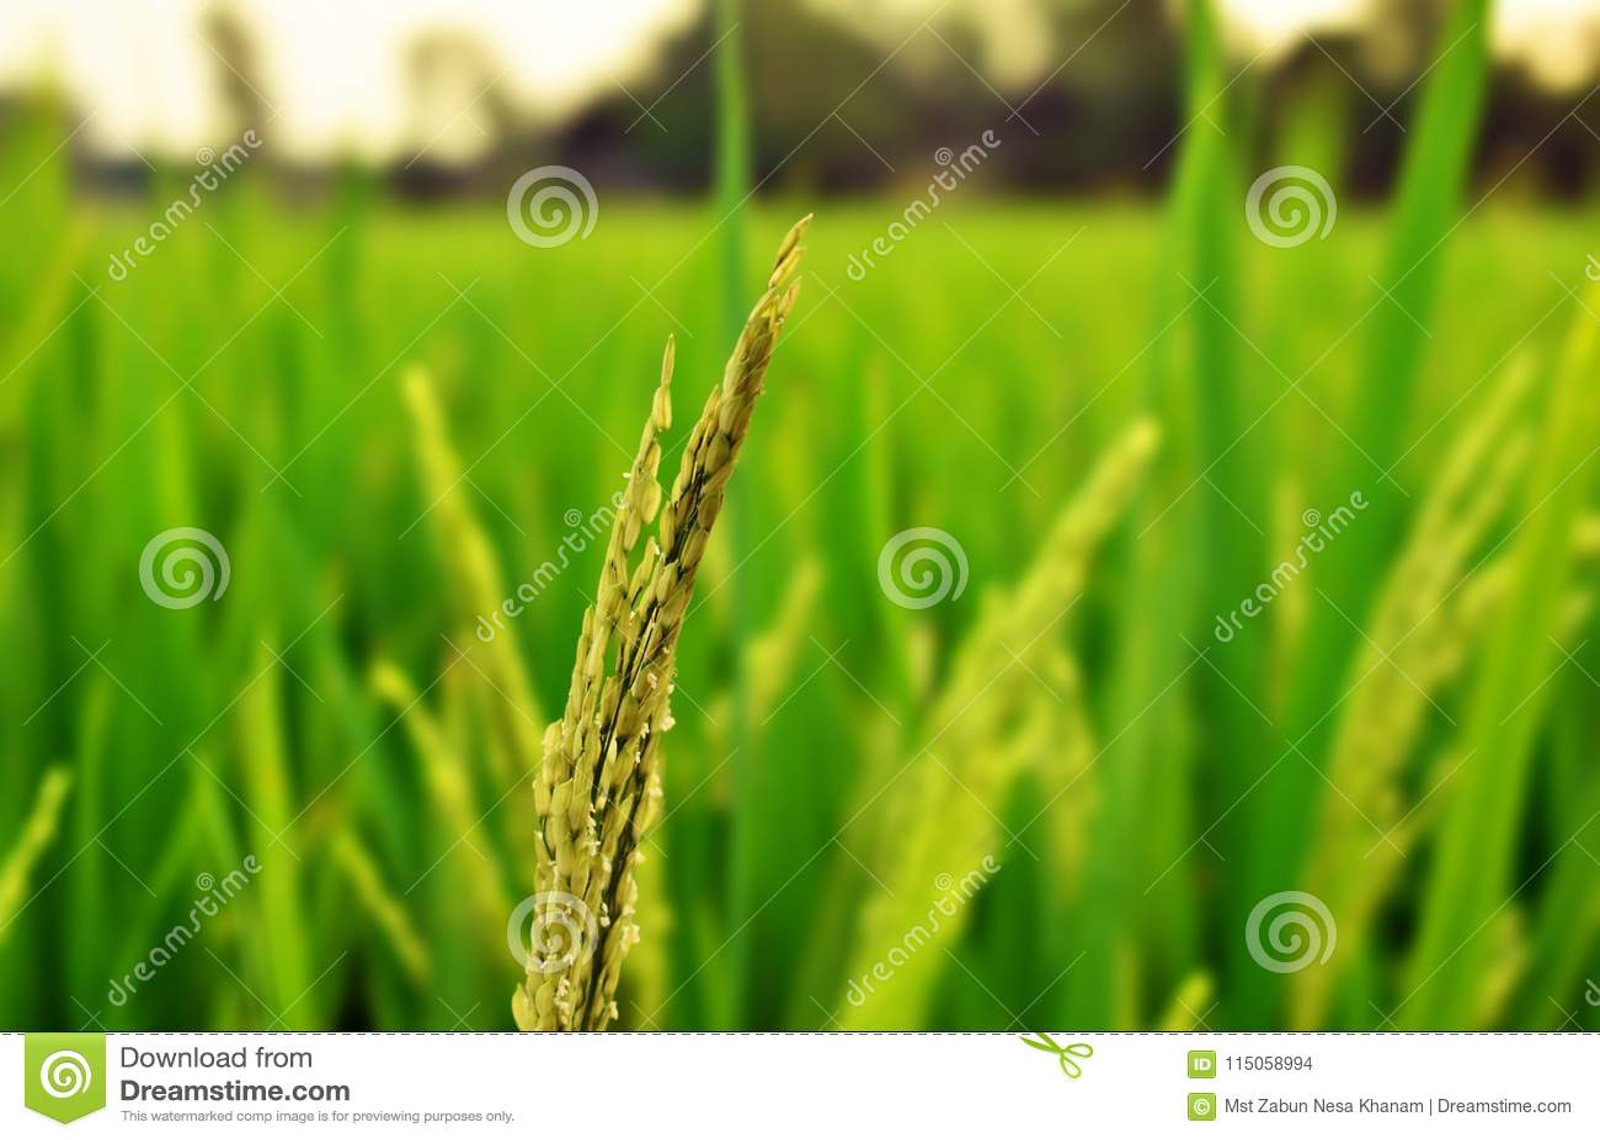 Tiro cercano del campo de arroz